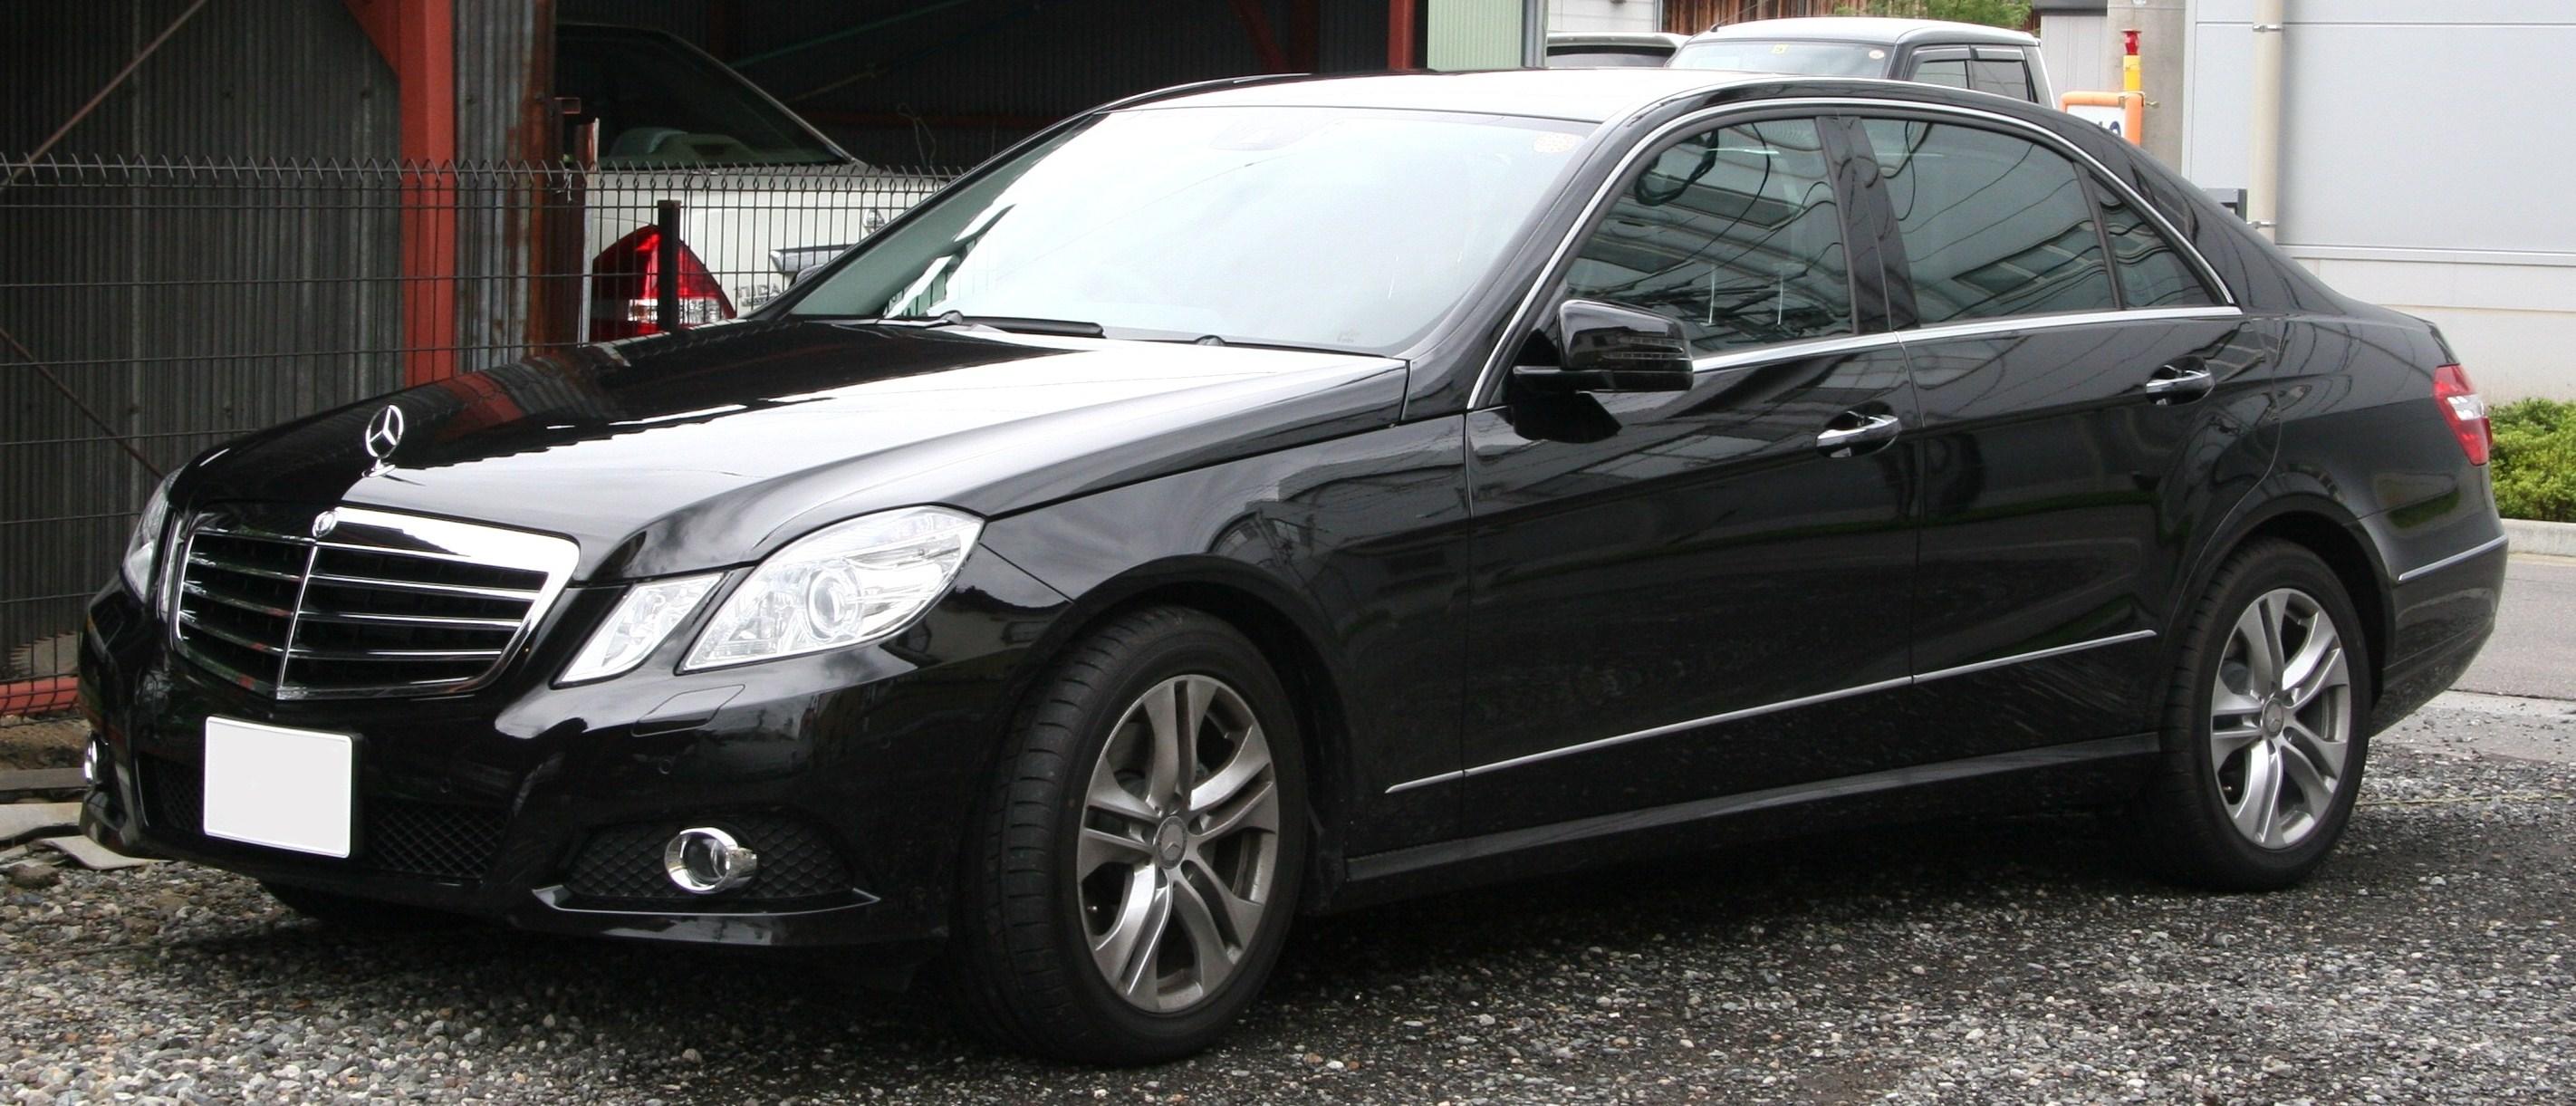 442971 E350 Sedan 20 Inch Rims 4 furthermore Exterior 47952897 likewise 2010 MercedesBenz CClass 6914998 furthermore 654528 20 Inch Wheel Upgrade C43 Post Pics moreover 2005 Mercedes Benz S Class Reviews C6091. on 2010 mercedes e350 sedan